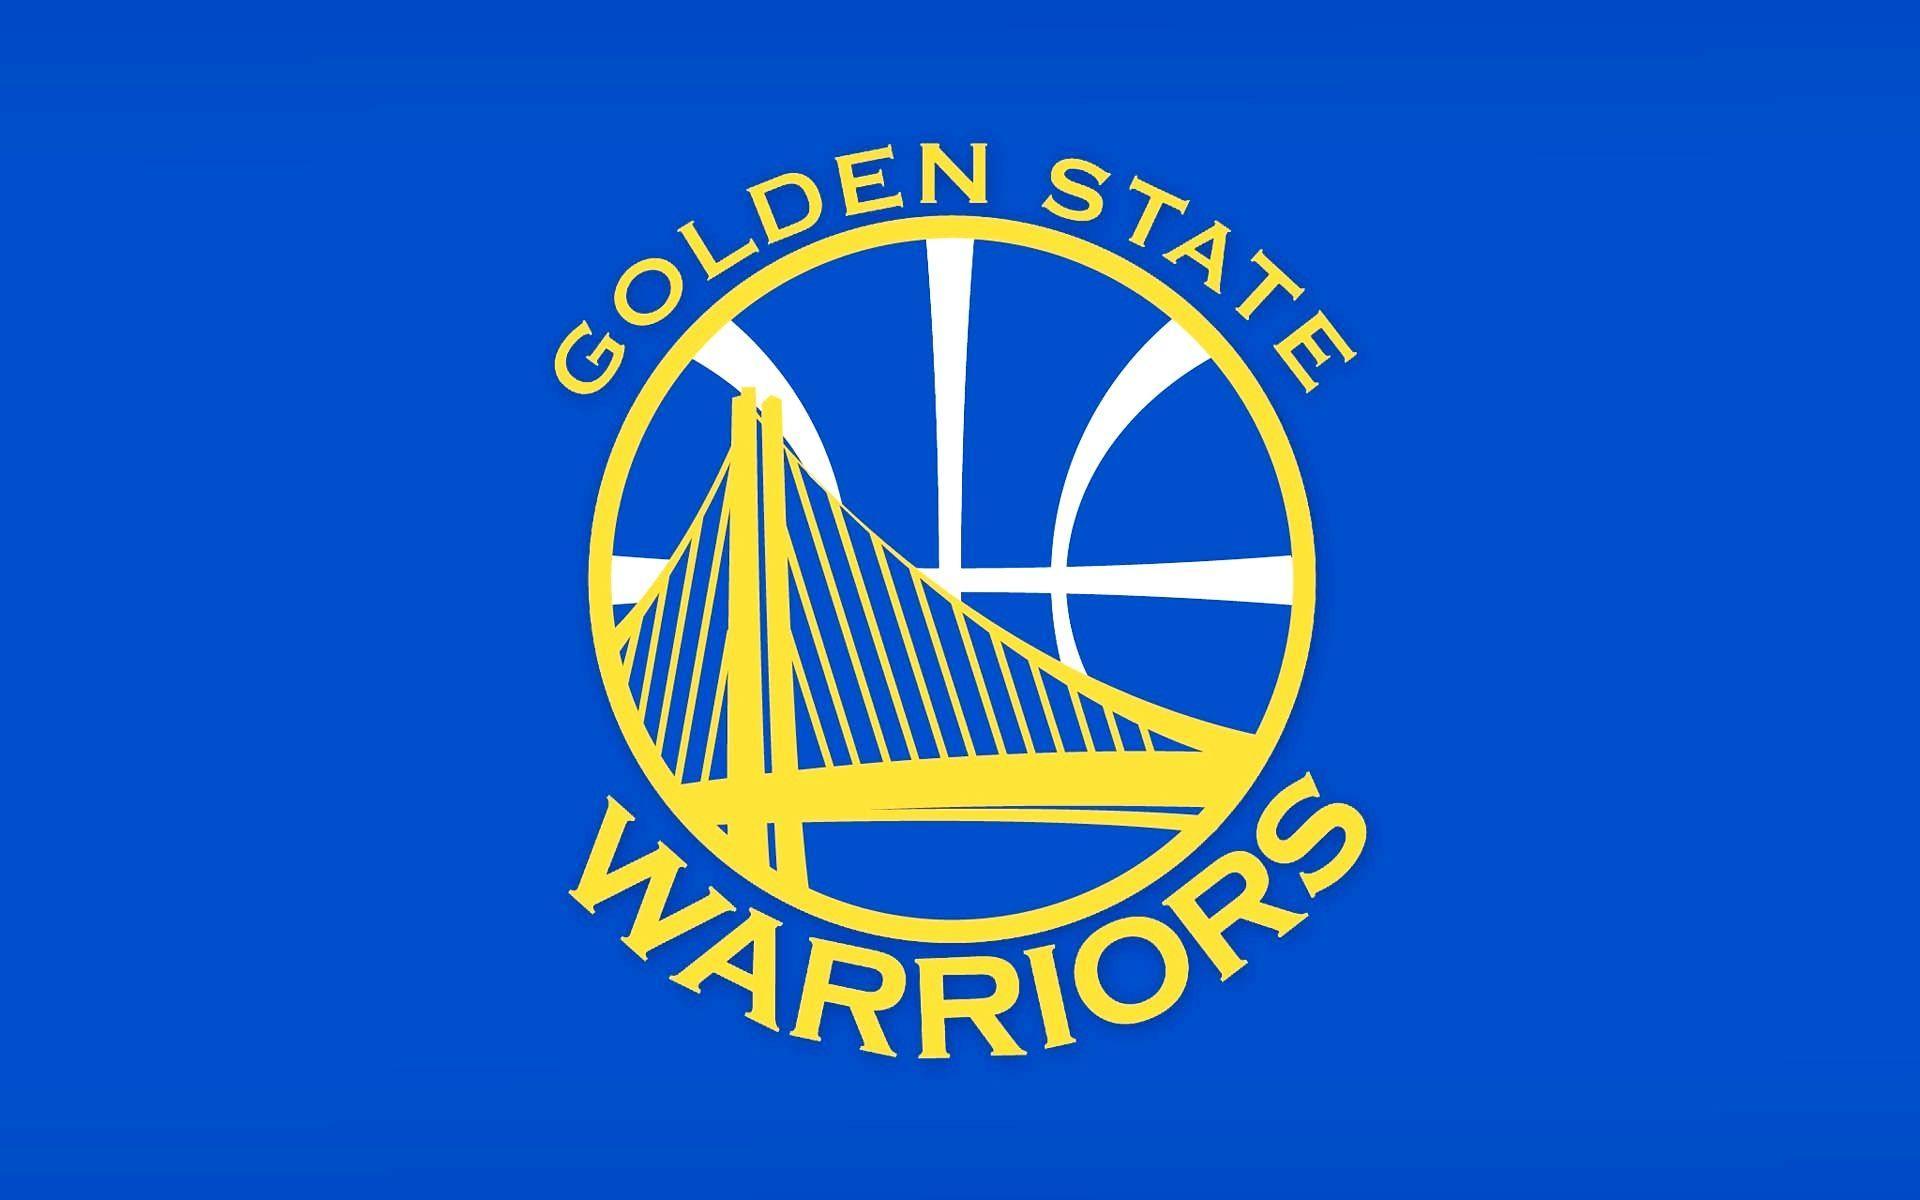 NBA Team Logos Wallpapers 2017.